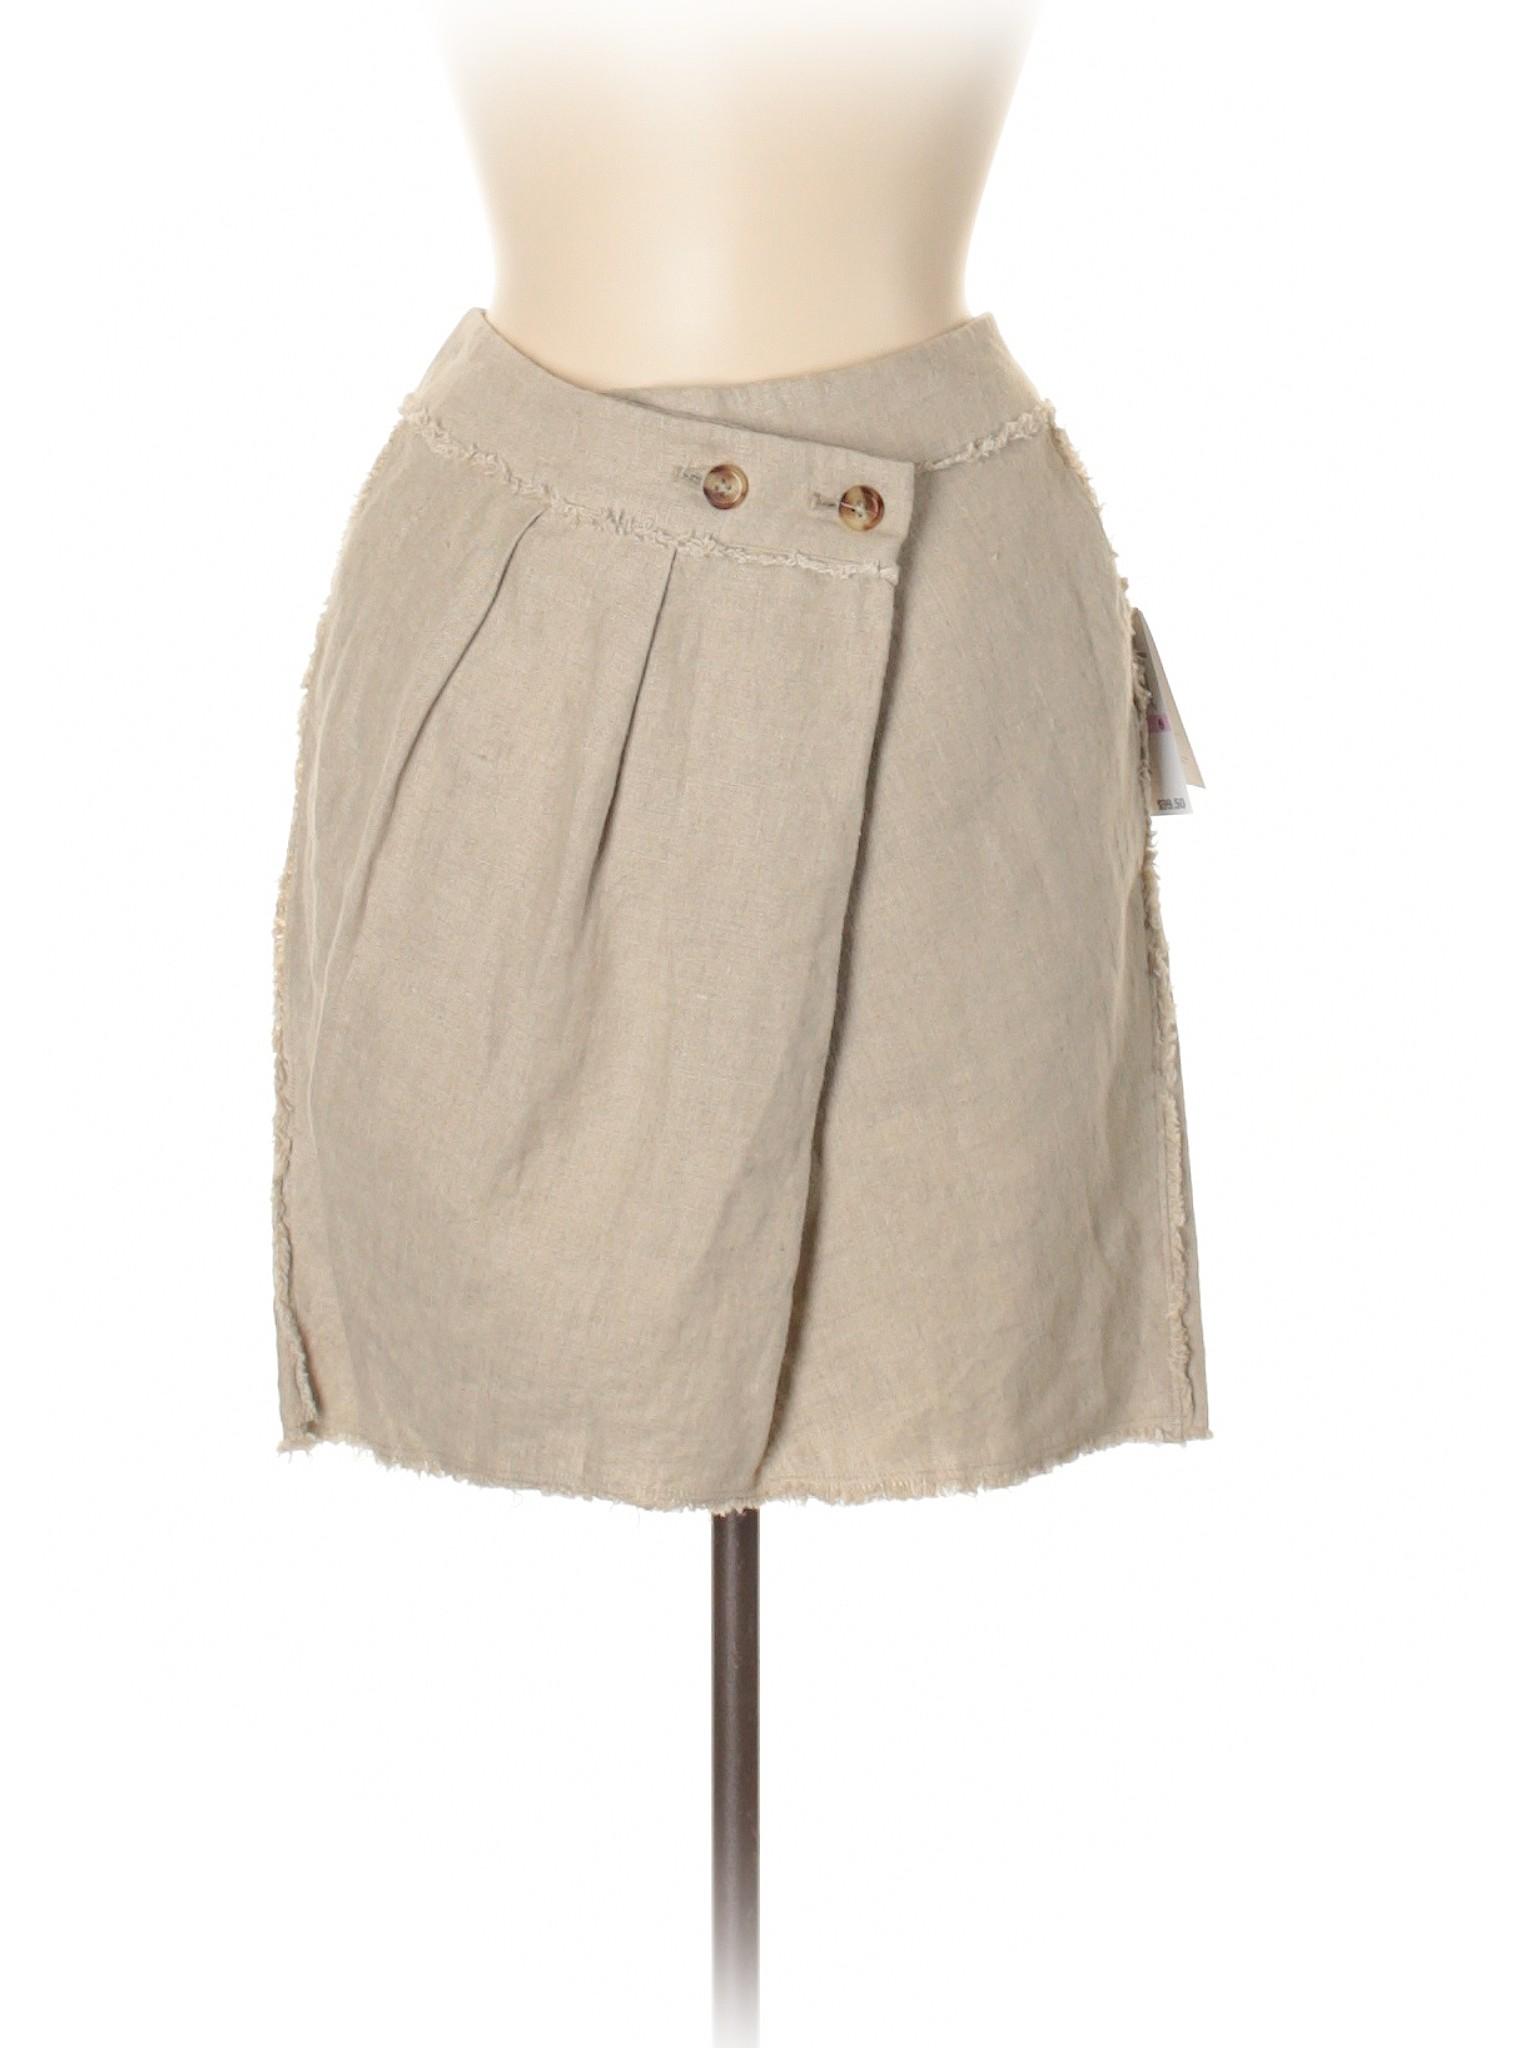 Casual Boutique Casual Casual Skirt Skirt Skirt Boutique Boutique Boutique xqqawrX